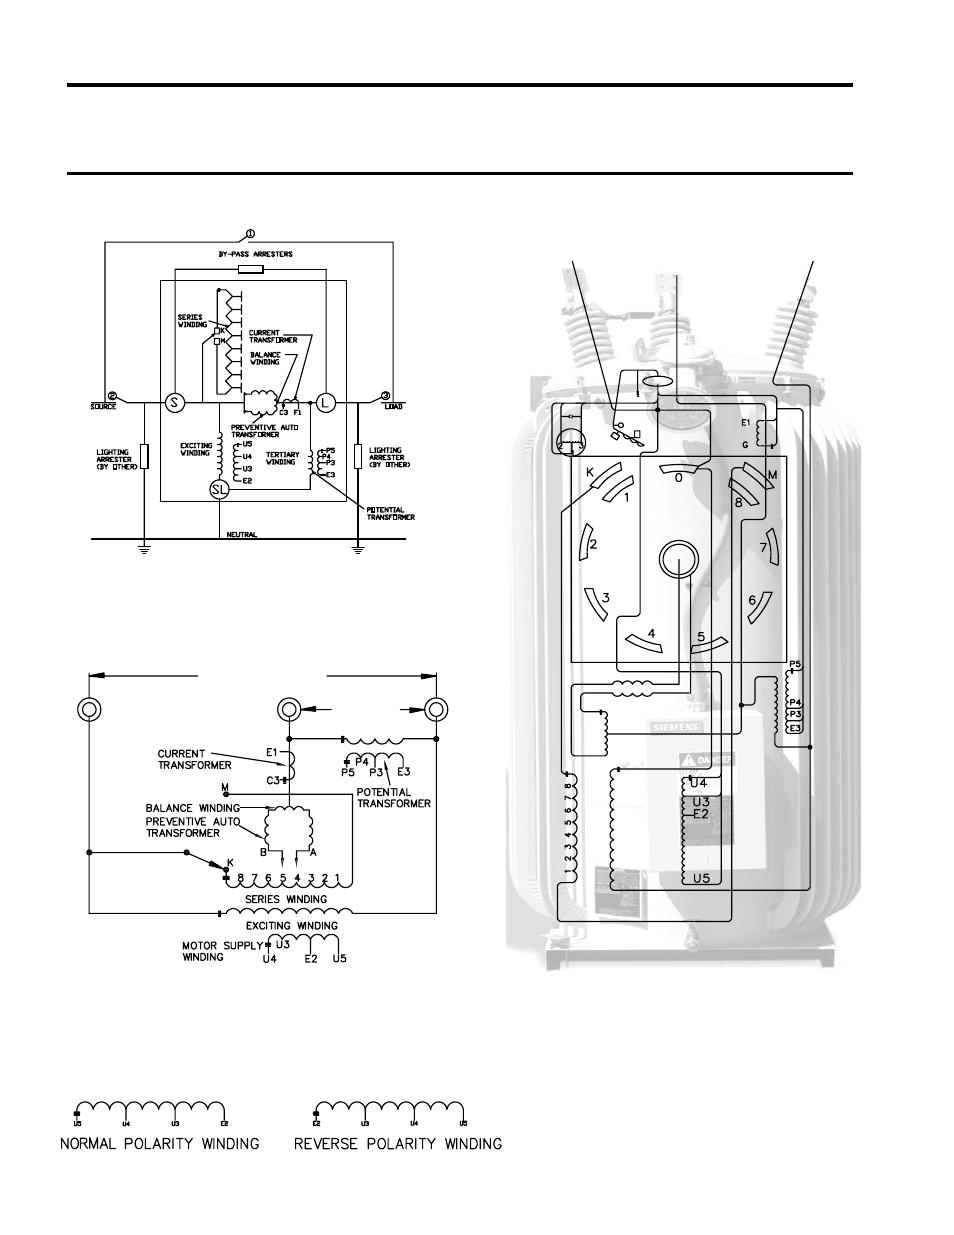 medium resolution of connection diagrams siemens jfr distribution step voltage regulator 21 115532 001 user manual